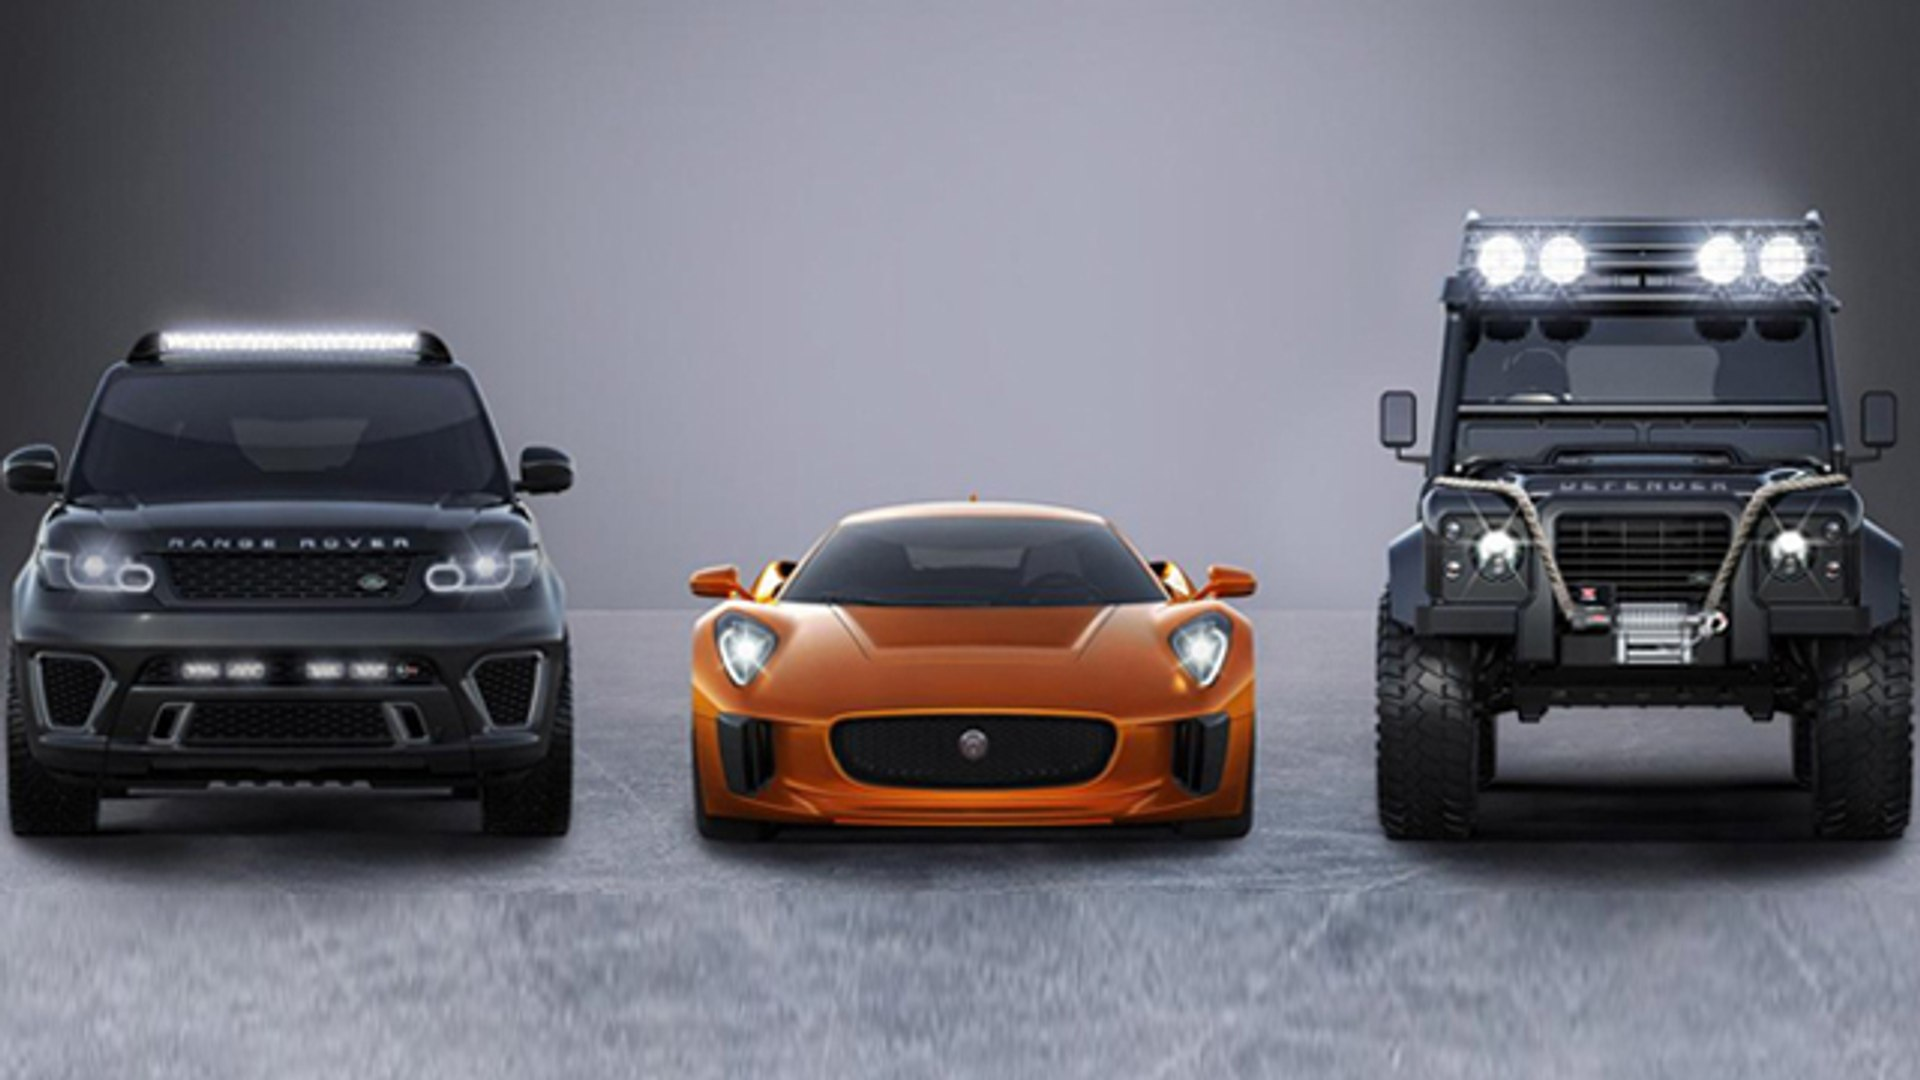 James Bond SPECTRE To Feature Jaguar C-X75, Range Rover Sport SVR And Land Rover Defender Big Foot